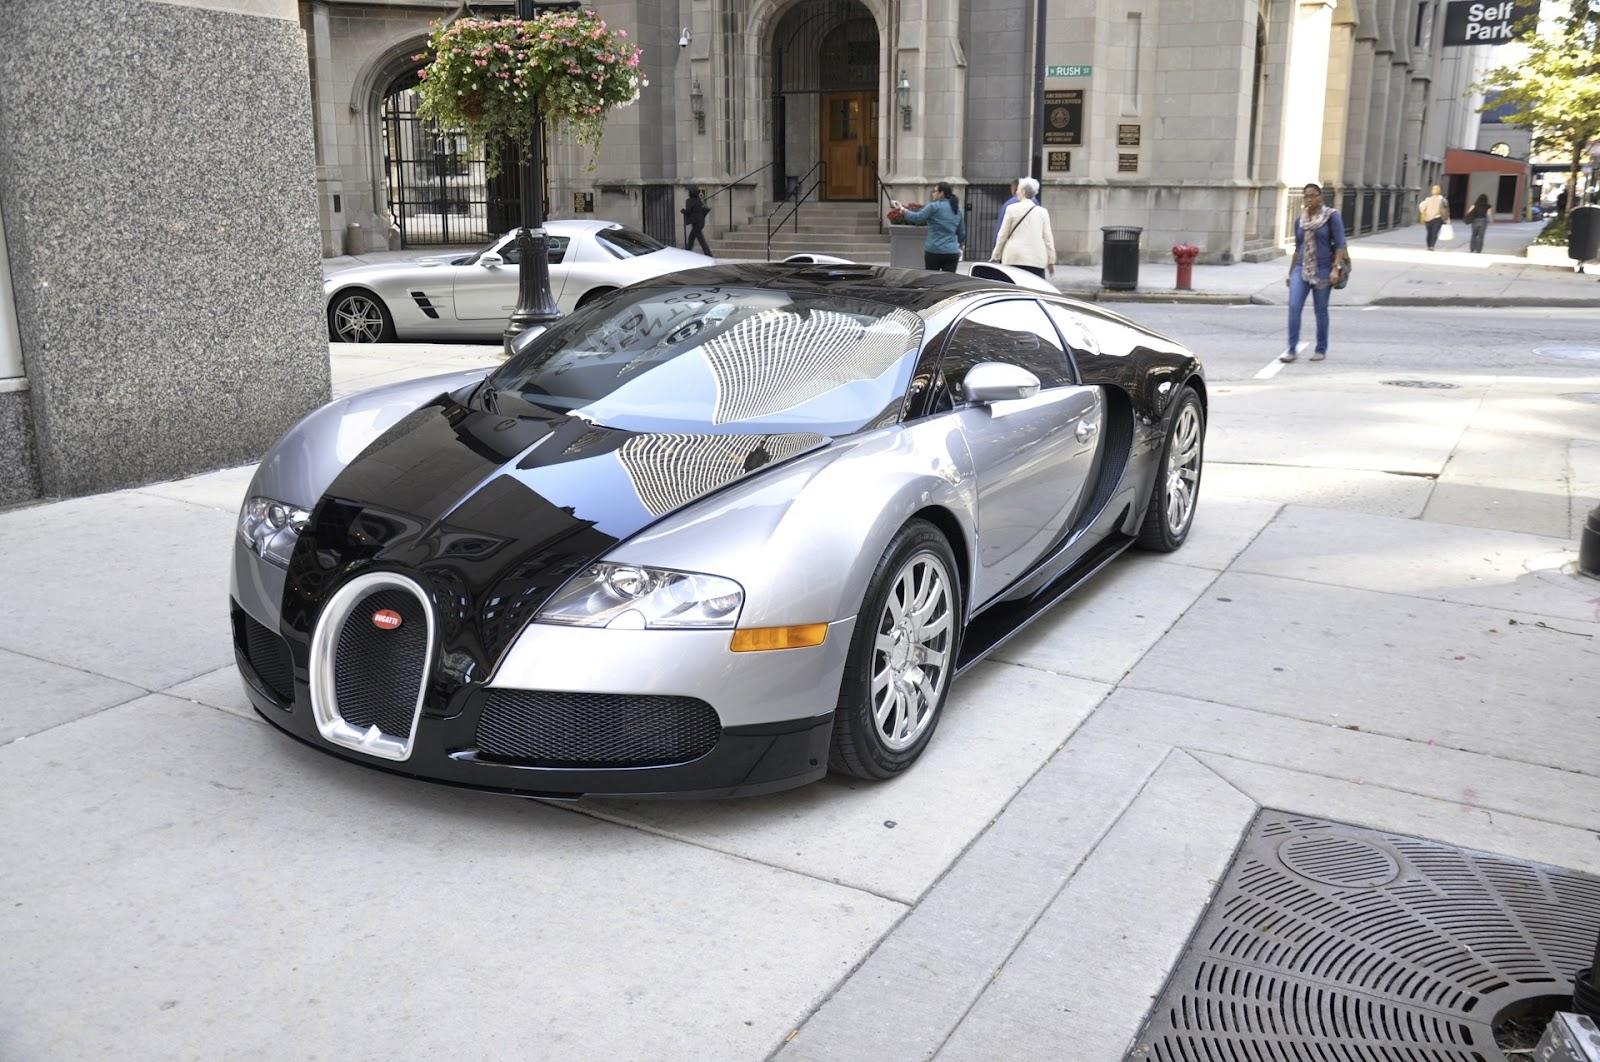 Bentley gold coast chicago